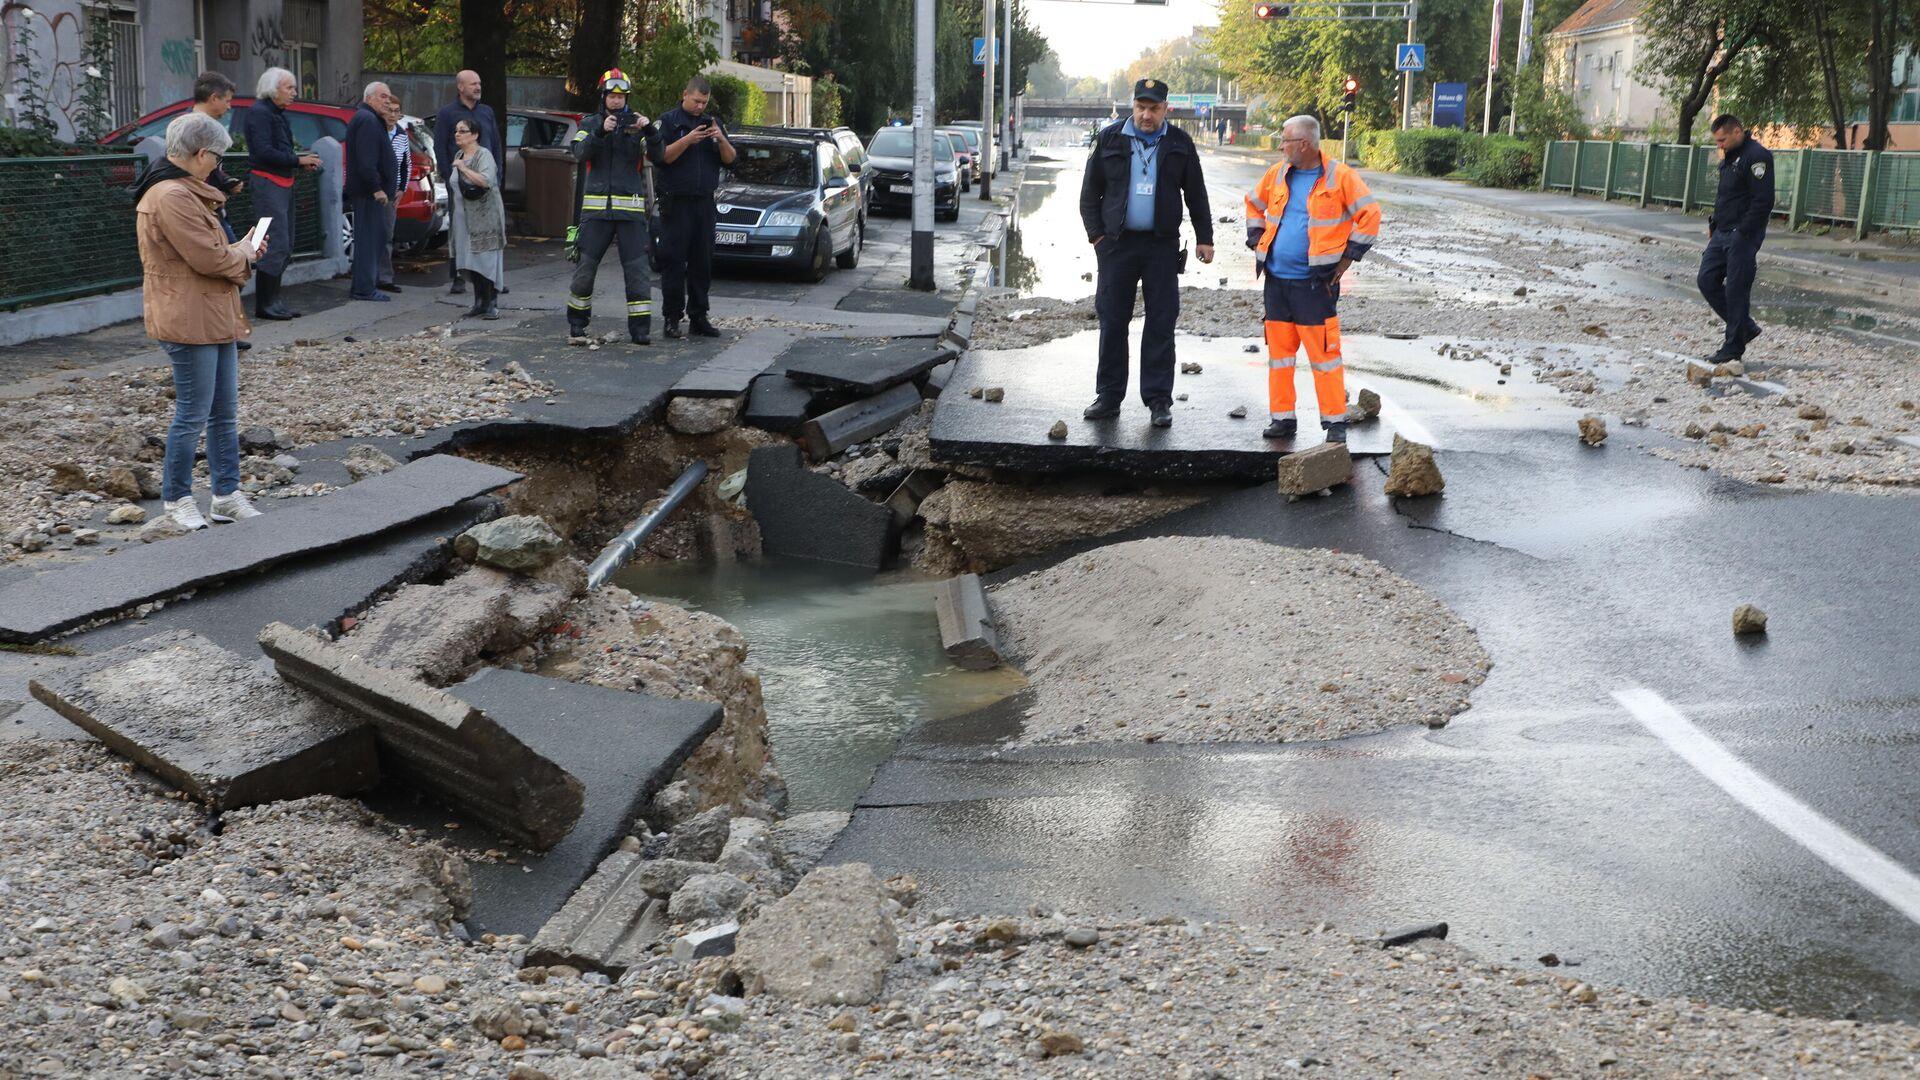 Poplava u Zagrebu nastala pošto je pukla vodovodna cev - Sputnik Srbija, 1920, 26.09.2021